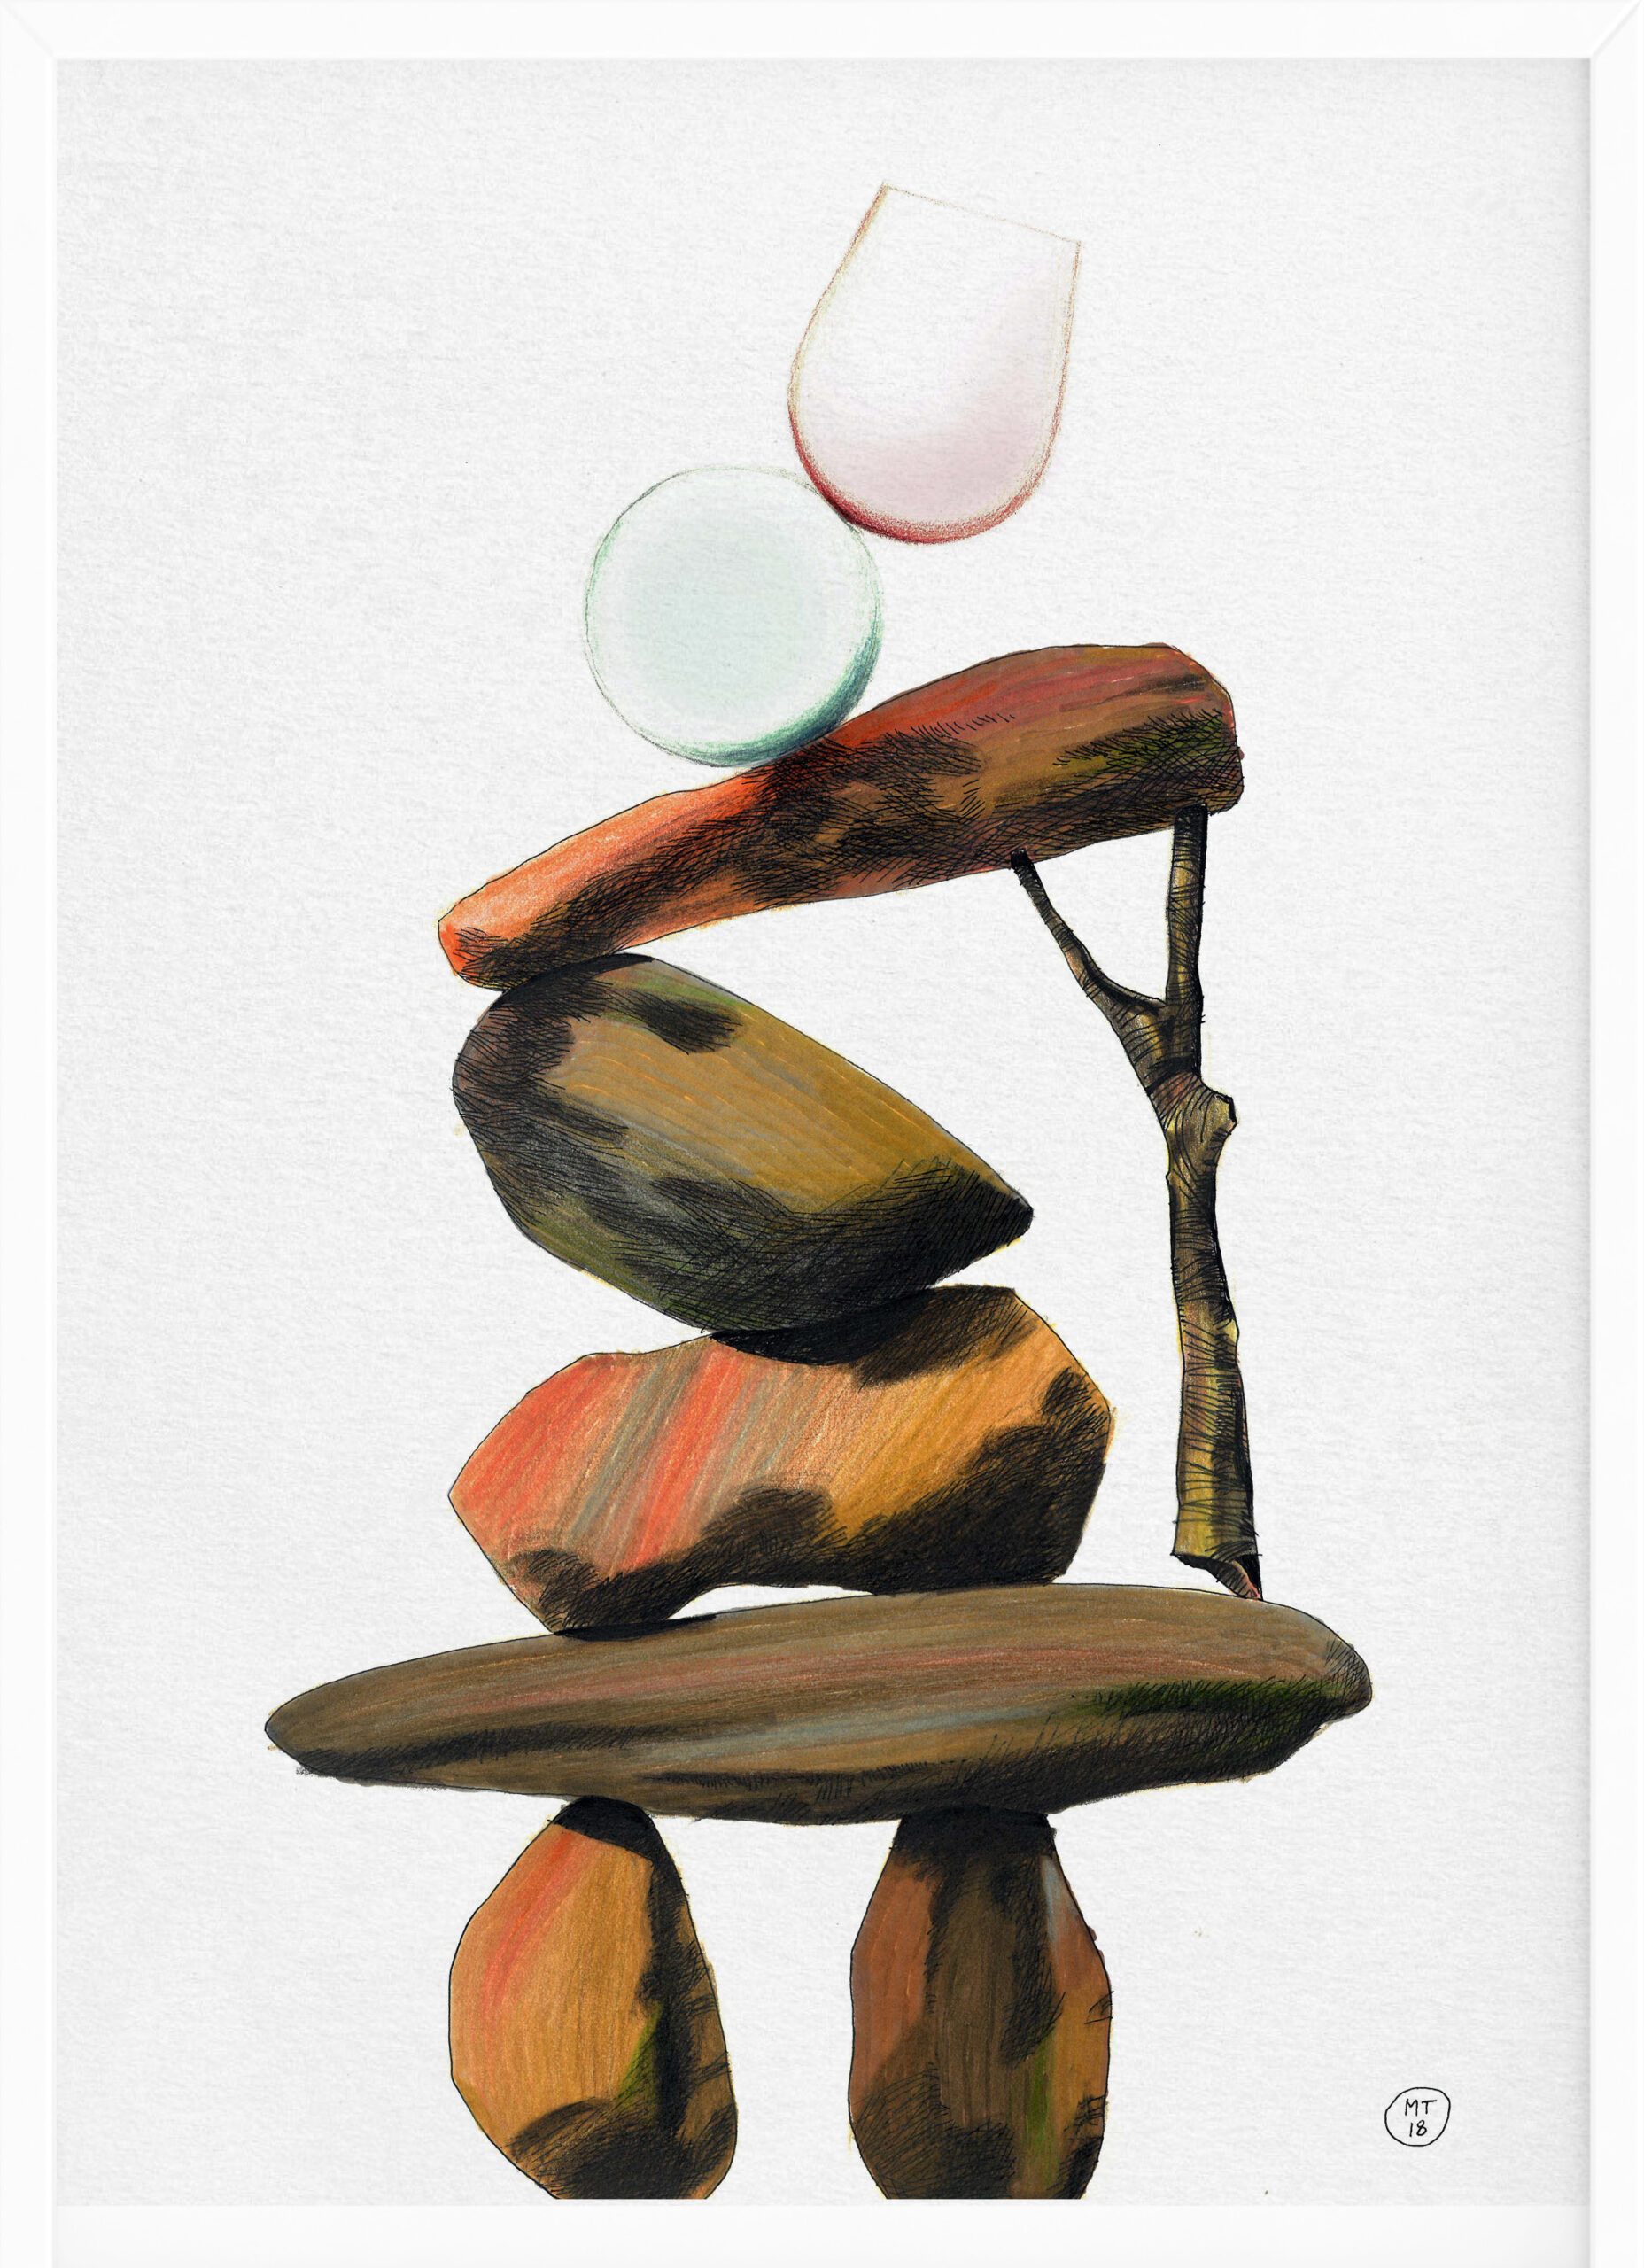 Caos | Drawings | Mario Trimarchi Design4